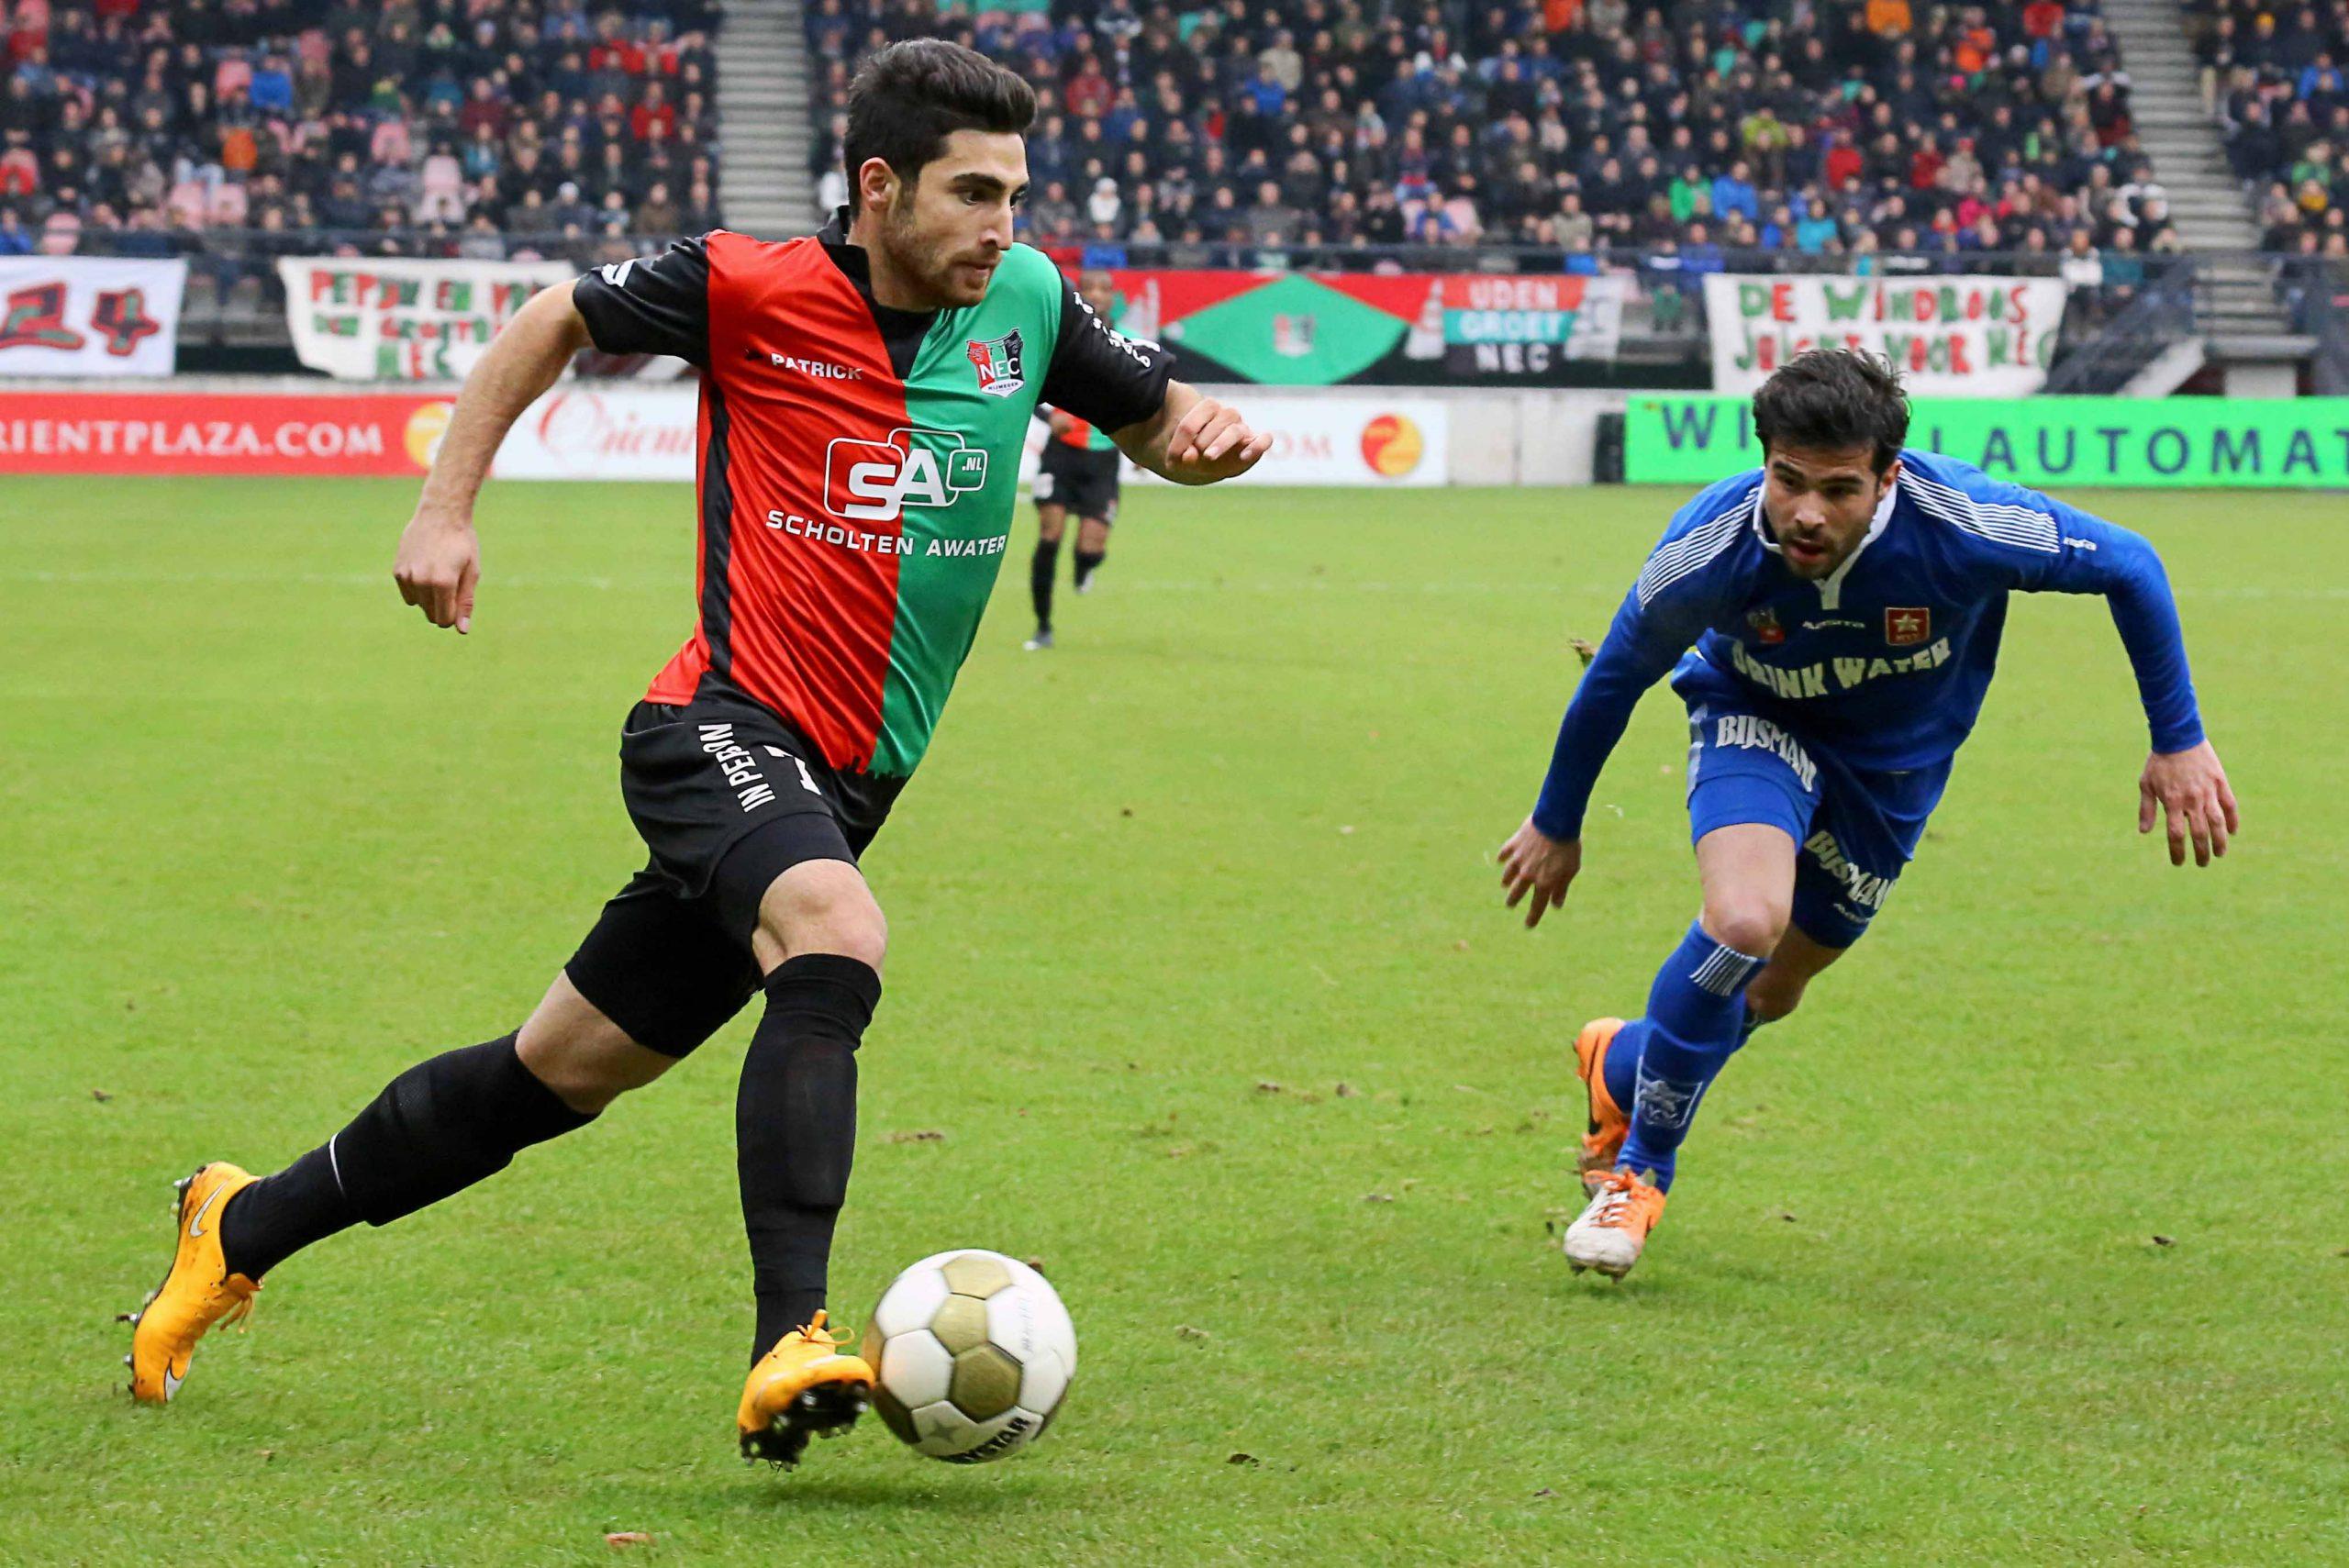 Waarom NEC maar weinig profiteert van transfers van oud-spelers